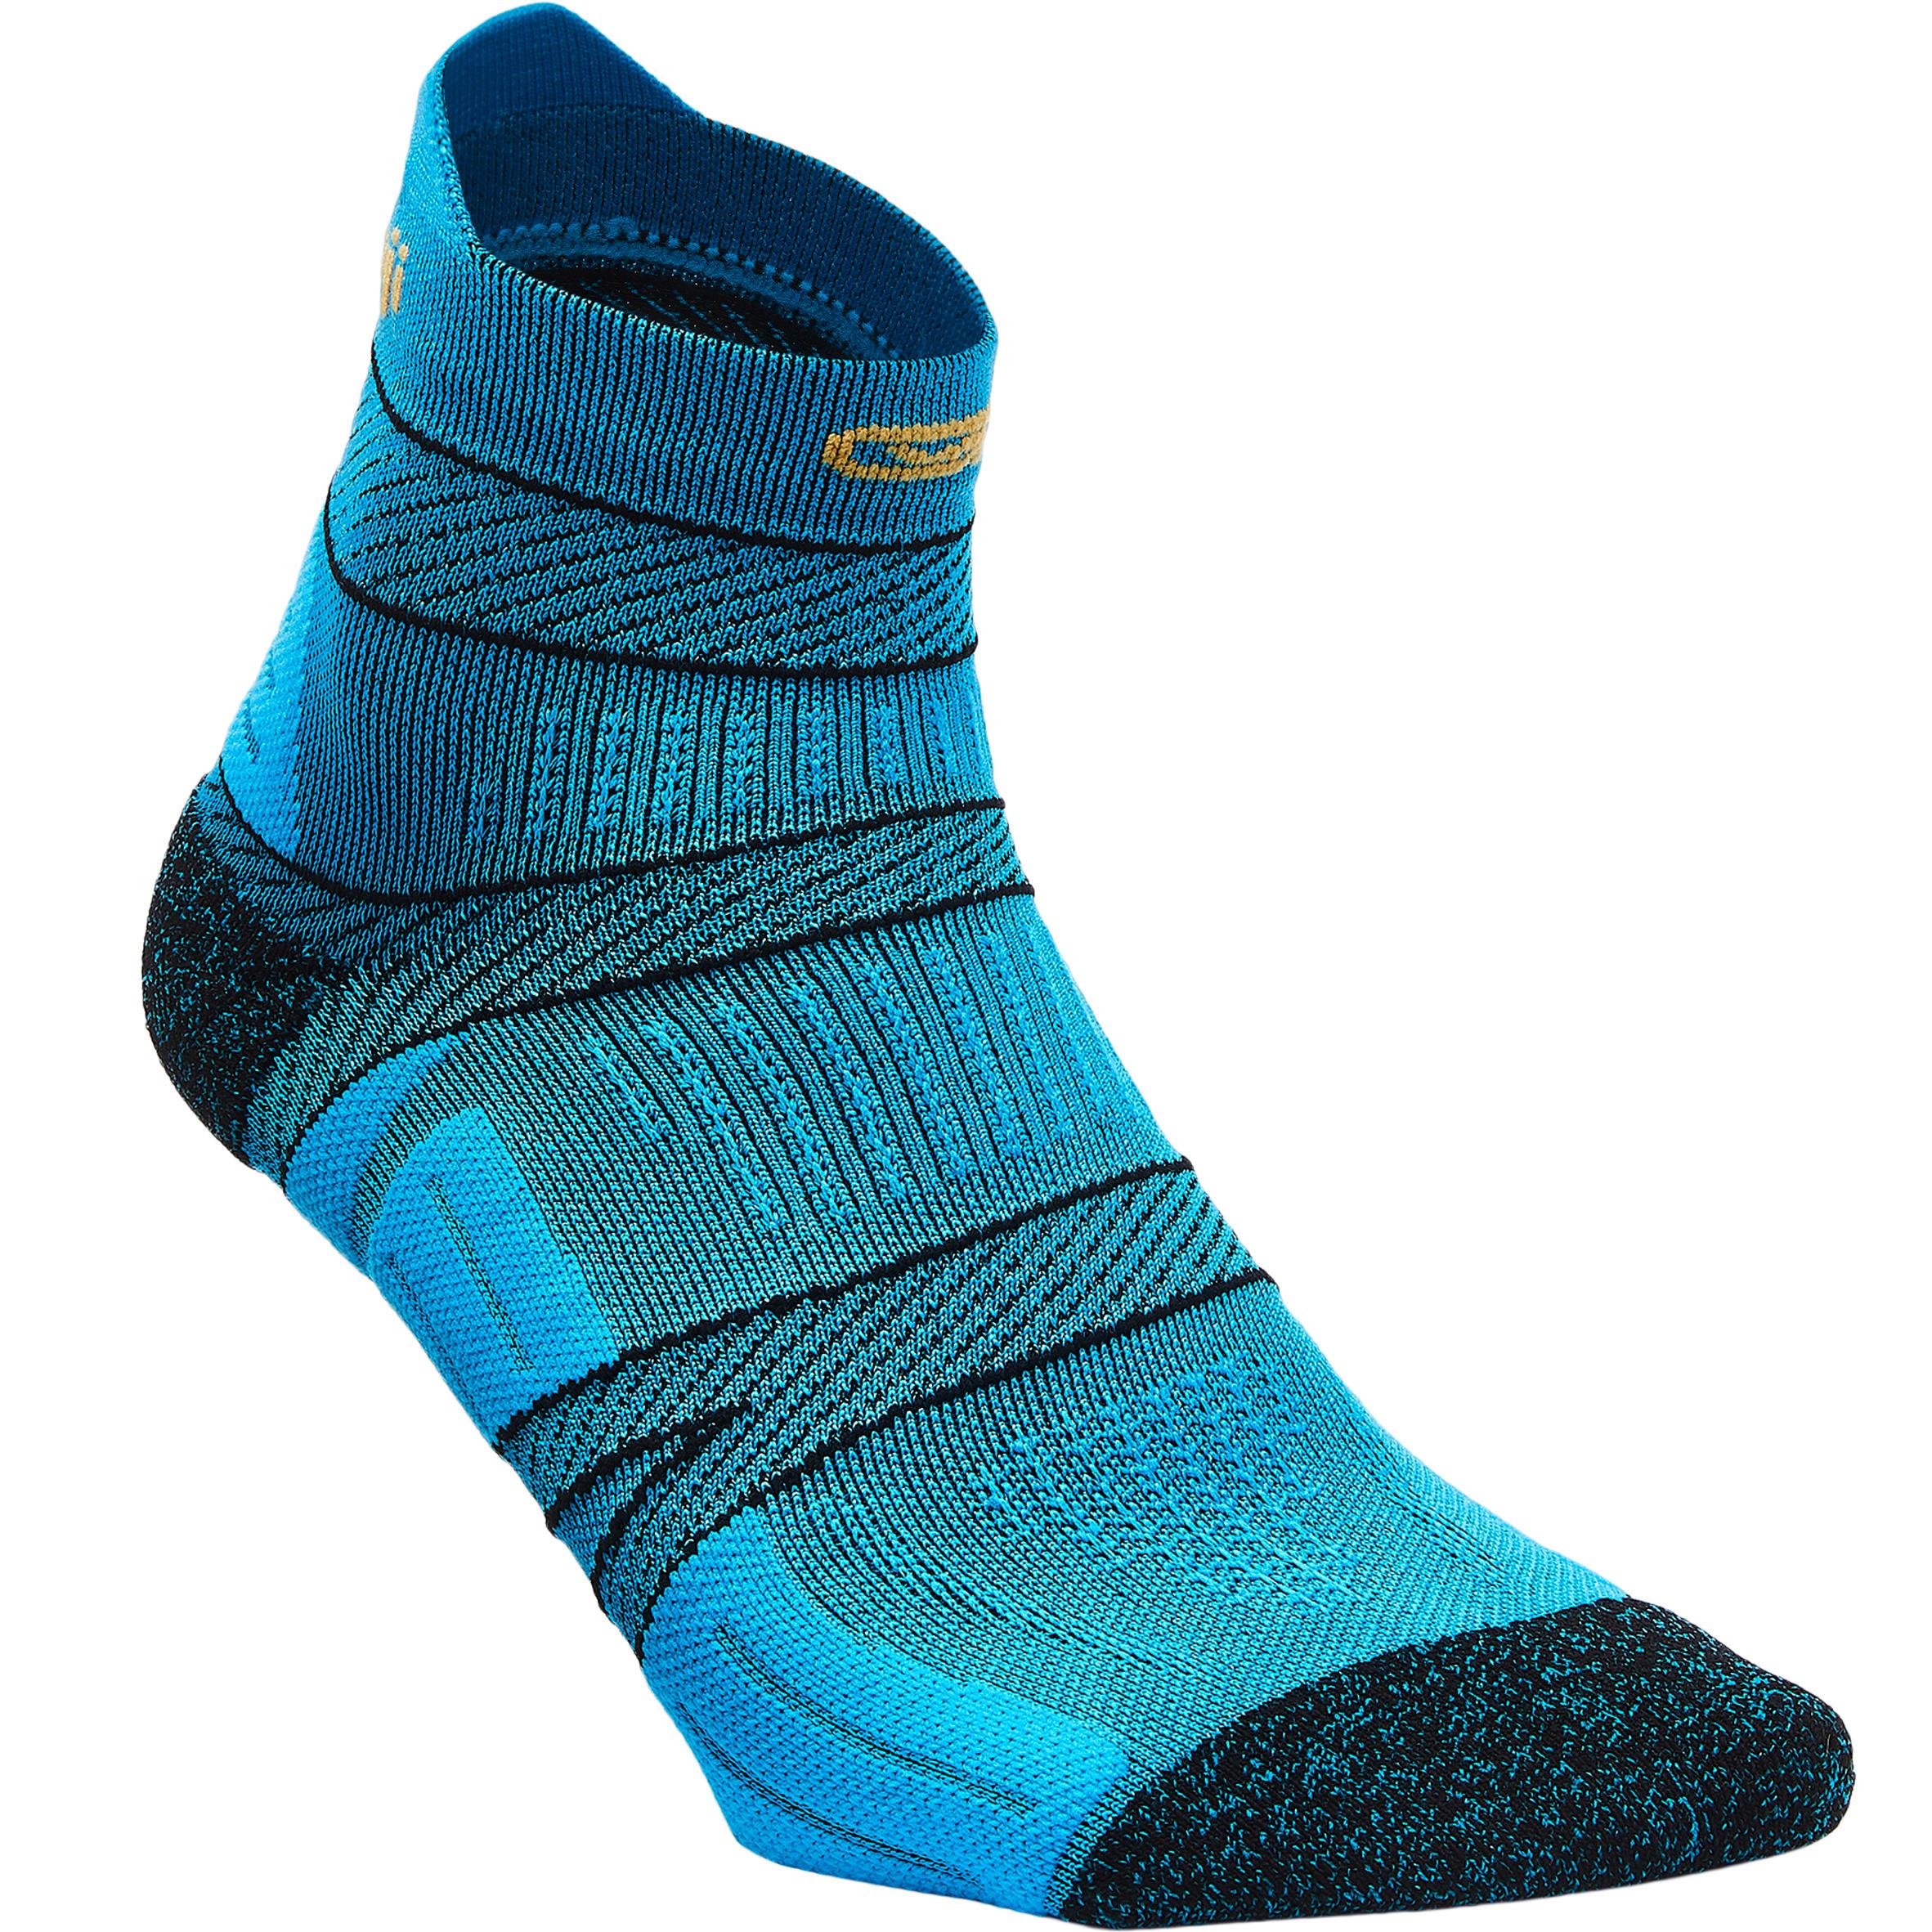 Kalenji Hardloopsokken dun Kiprun Strap blauw